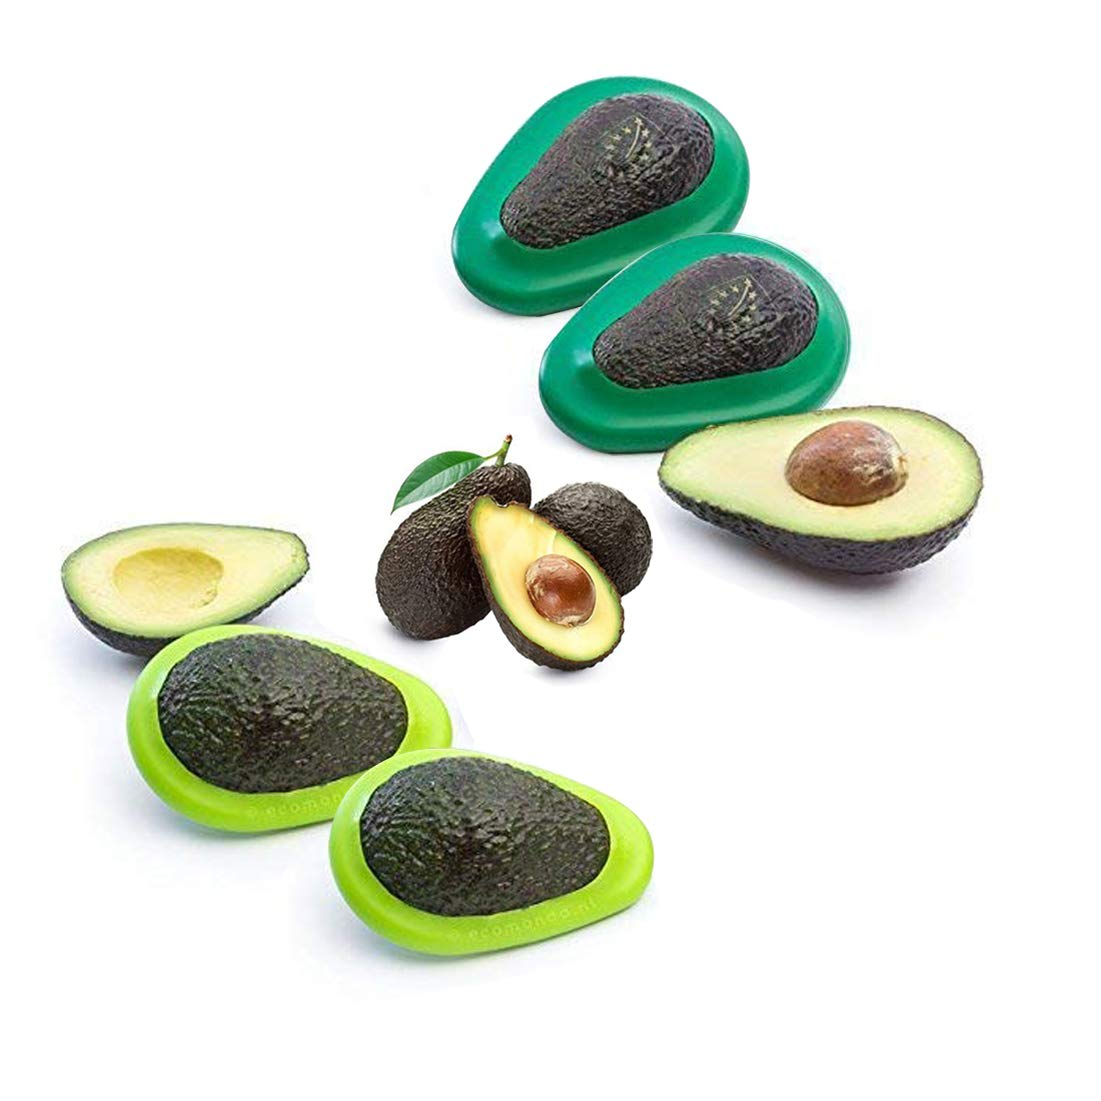 Ruibo 3 in 1 Avocado Slicer and Pitter Green - Multi-functional Avocado Peeler Cutter Skinner and Corer Tool